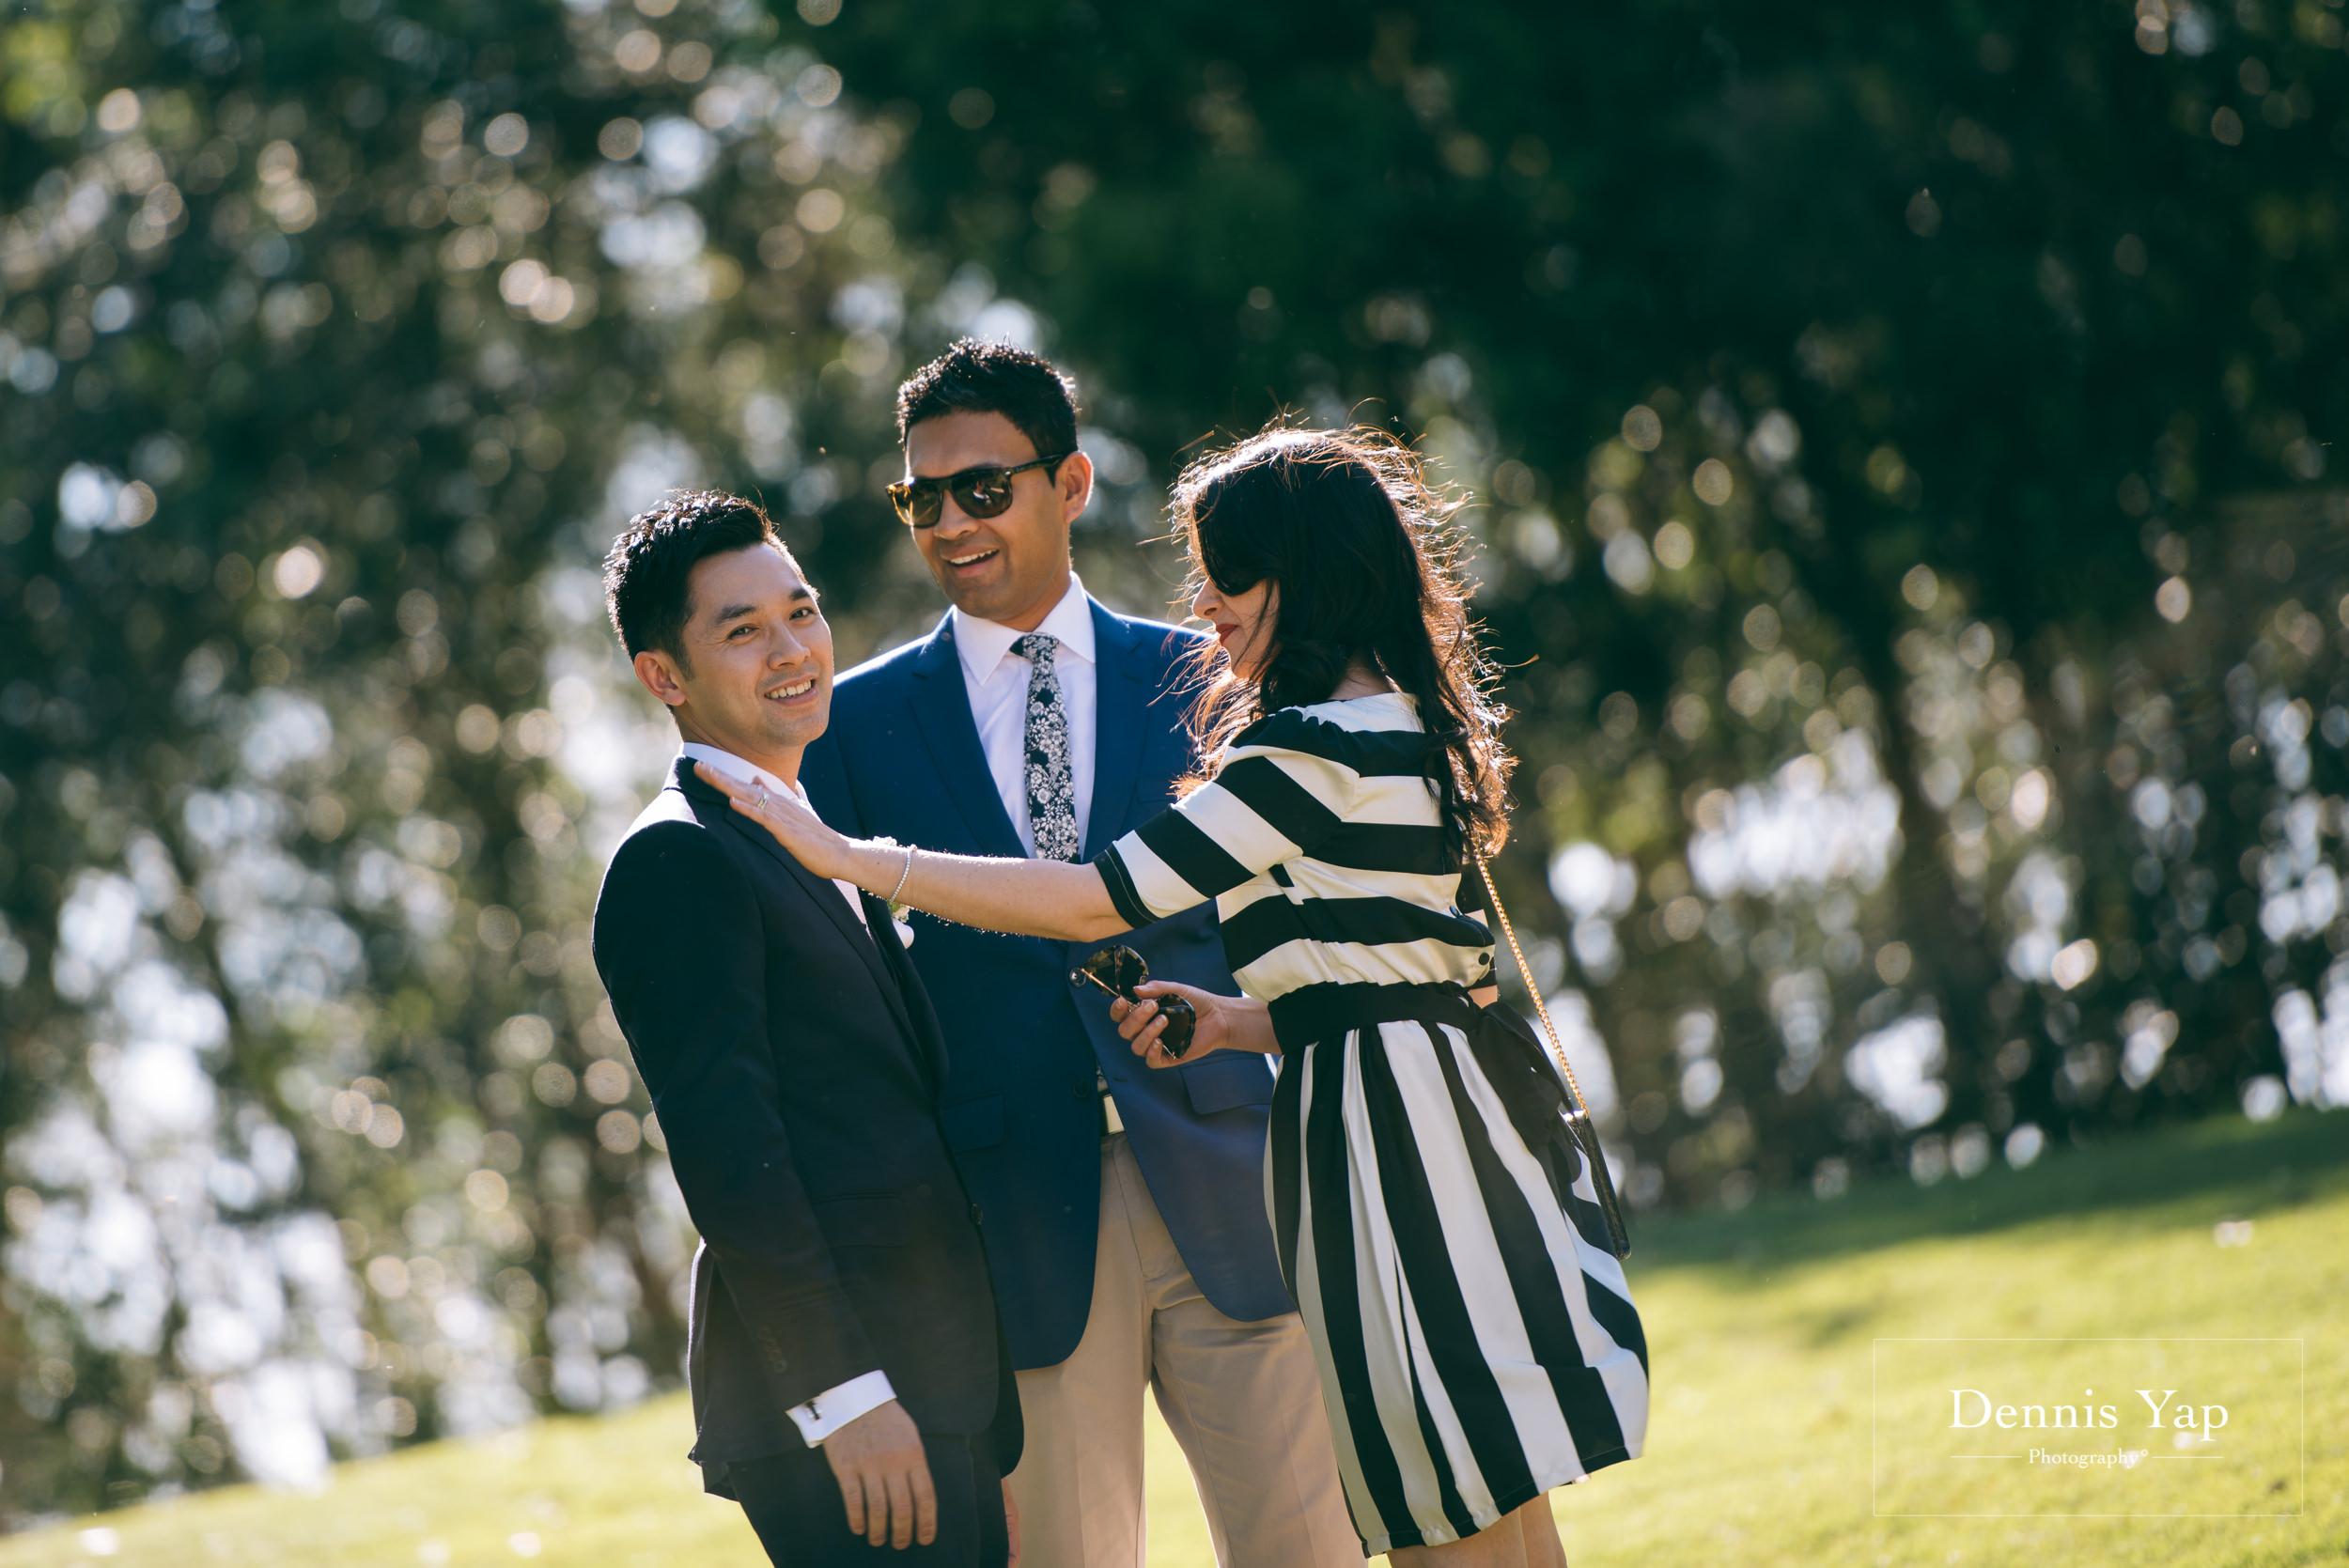 thang veng vietnamese wedding brisbane dennis yap photography malaysia wedding photographer-19.jpg